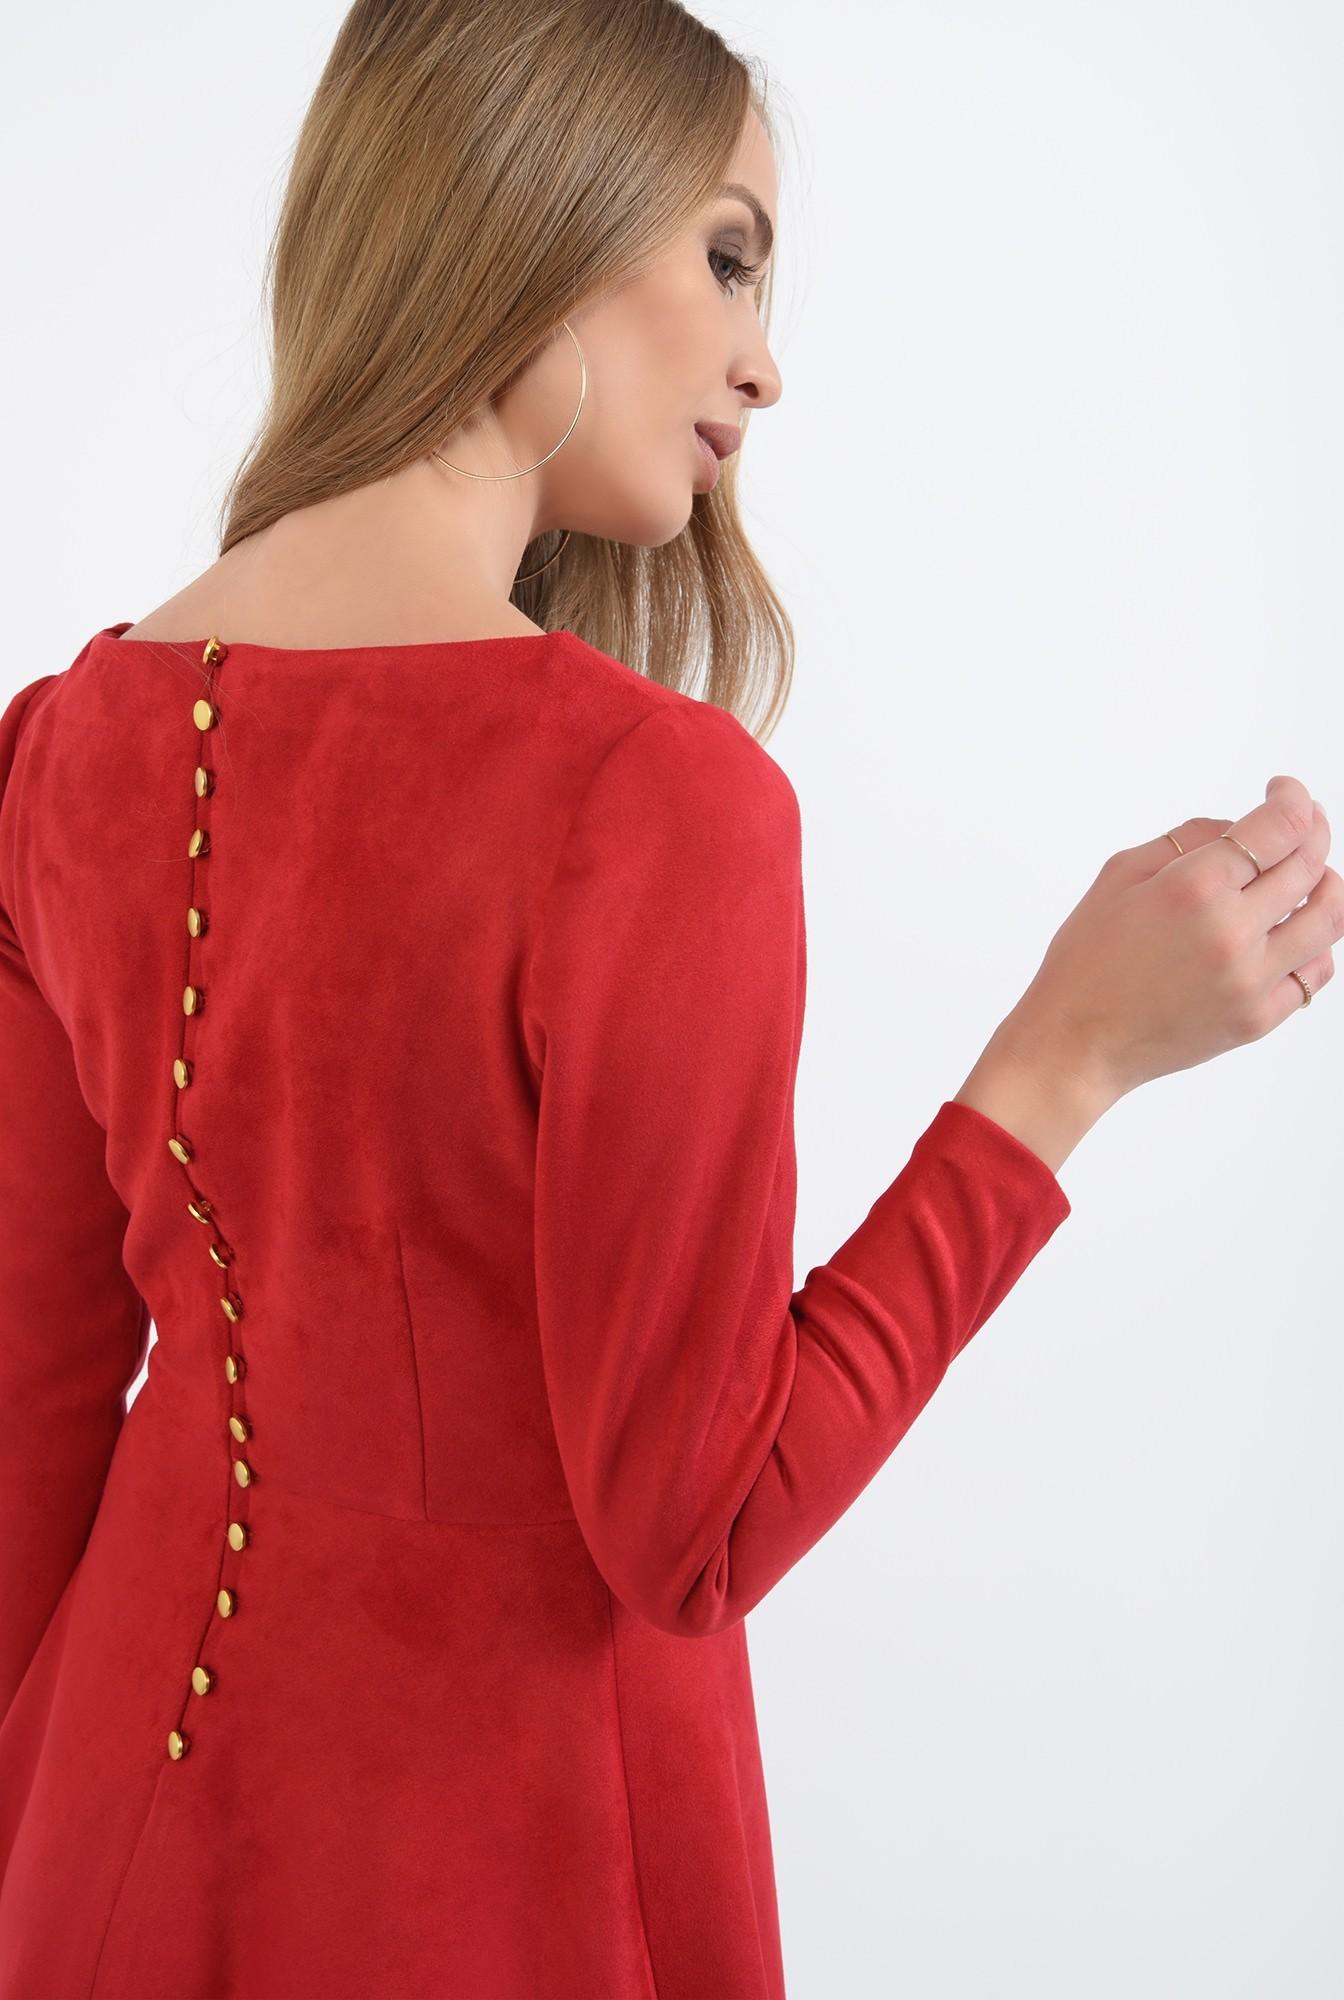 1 - rochie rosie, cu nasturi metalici la spate, evazata